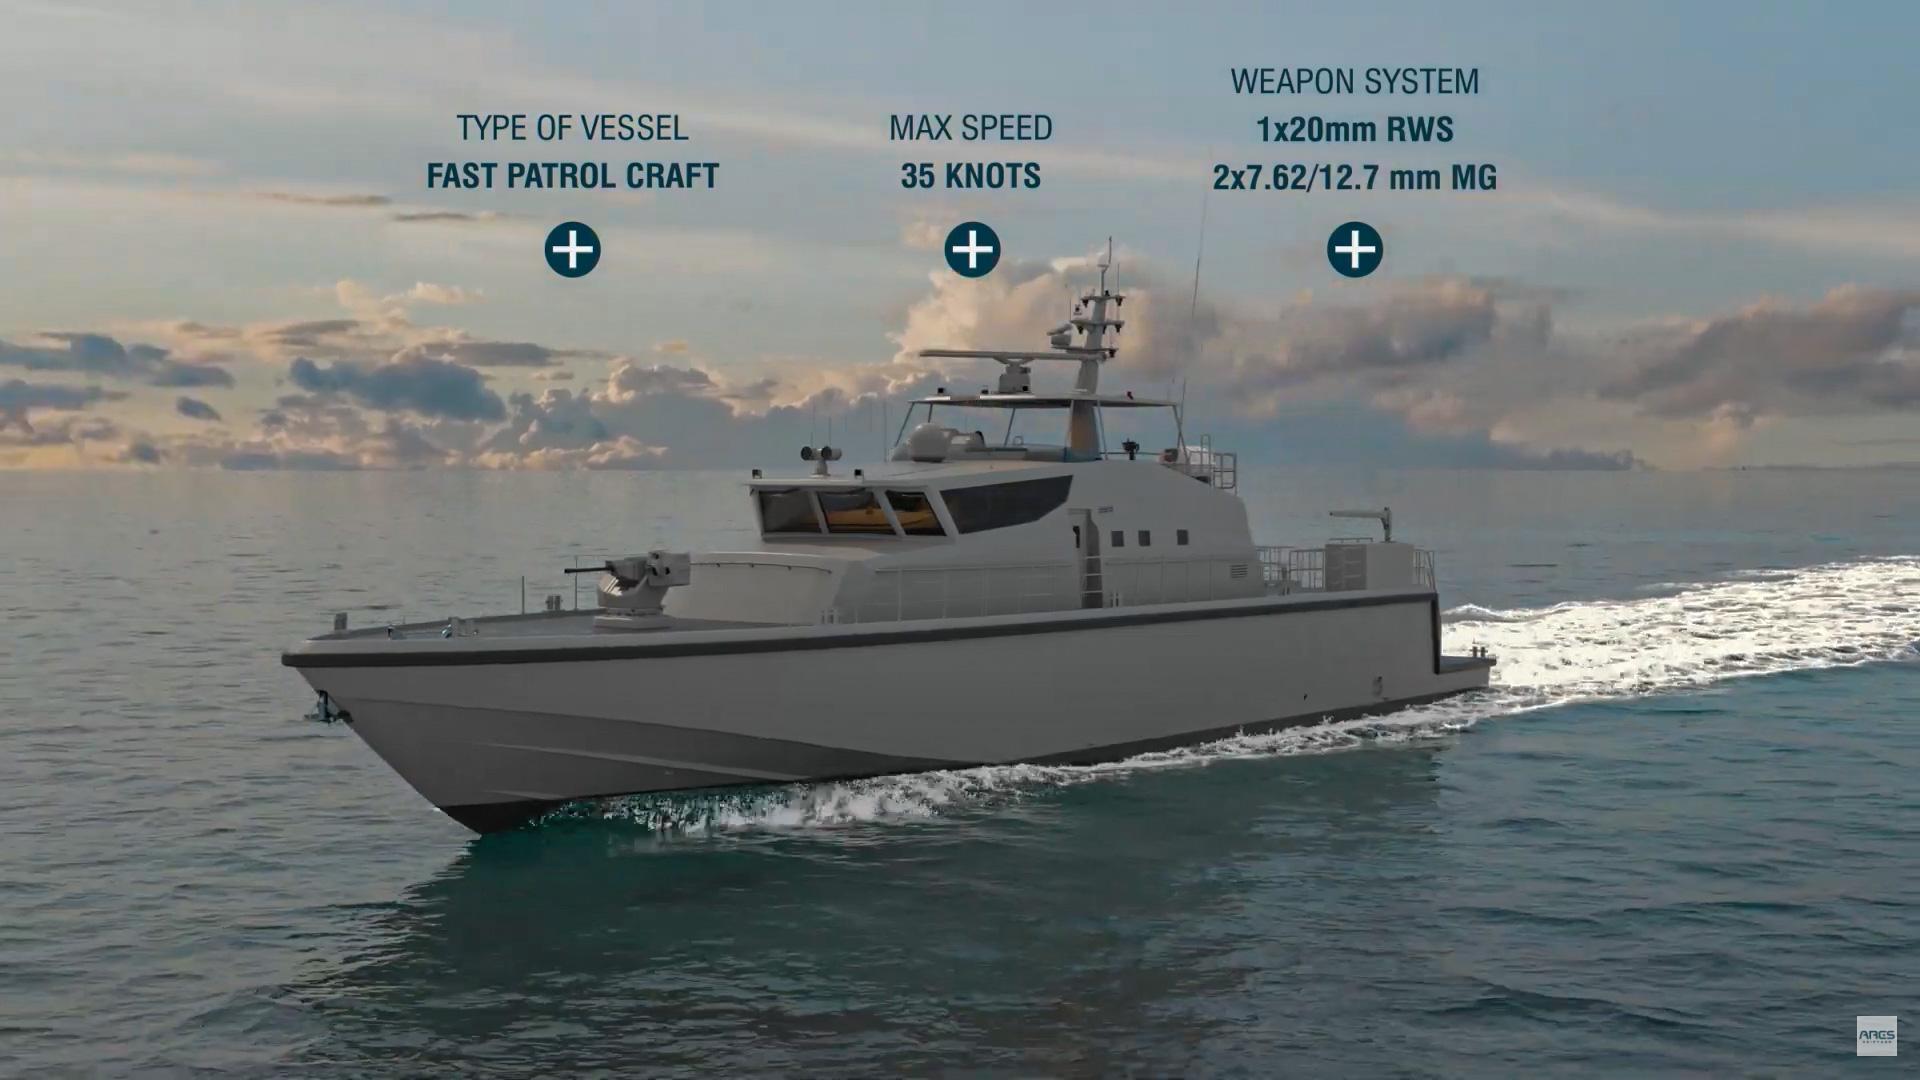 images/uploads/d/media/2021-09-29-ares-115-hercules-fast-patrol-boat_1633070625.jpeg